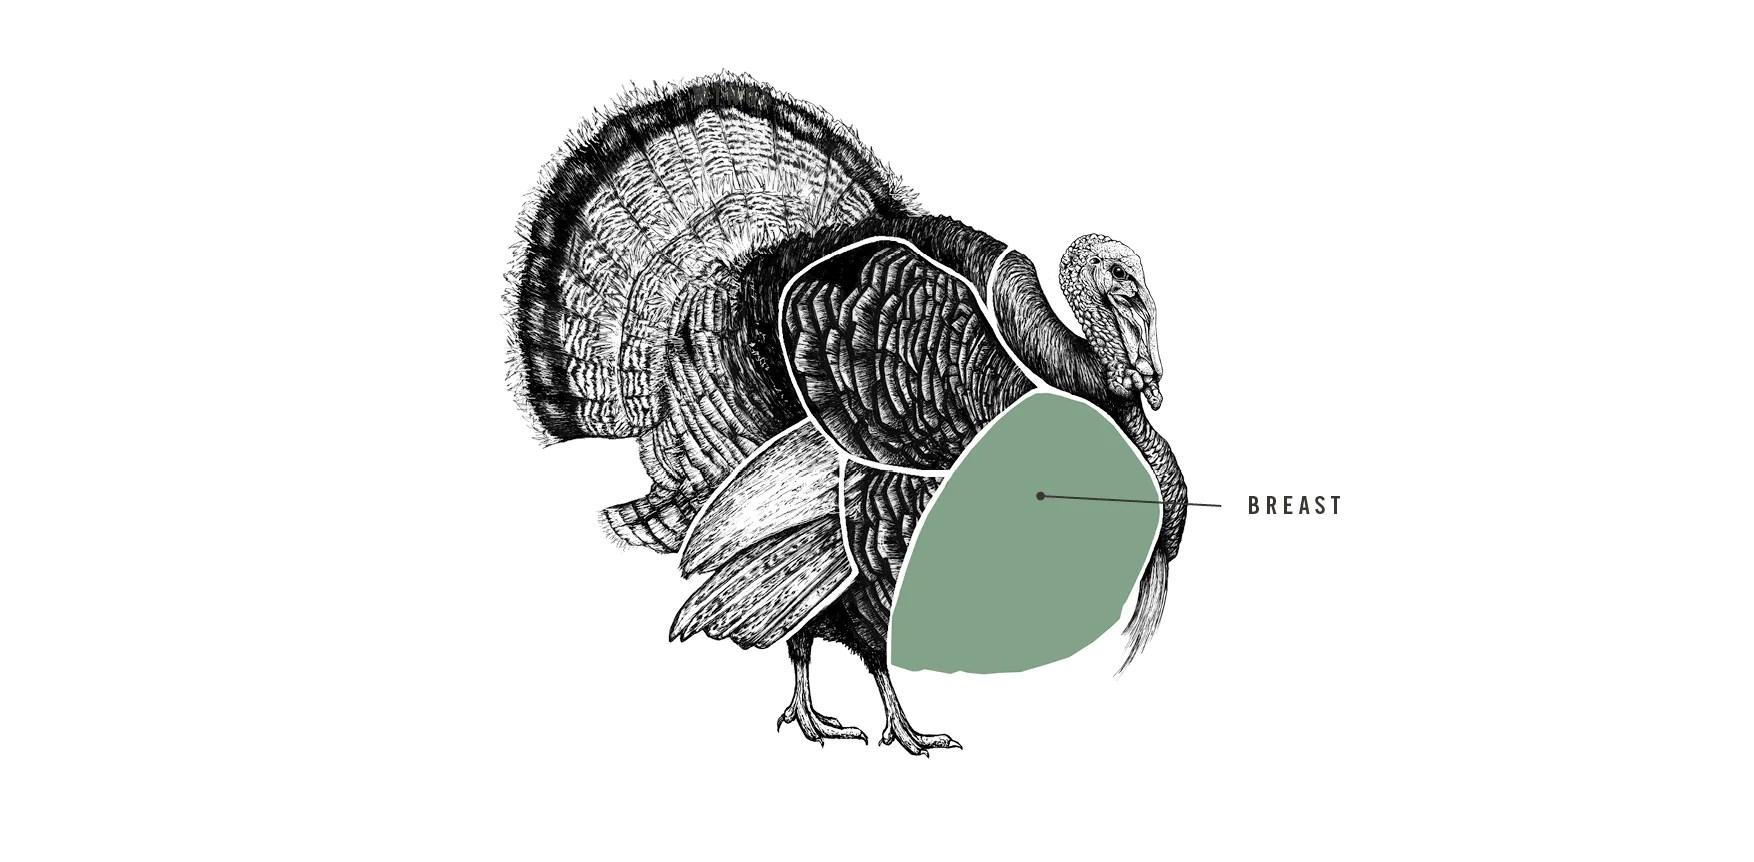 hight resolution of free range bronze turkey breast meat cuts diagram